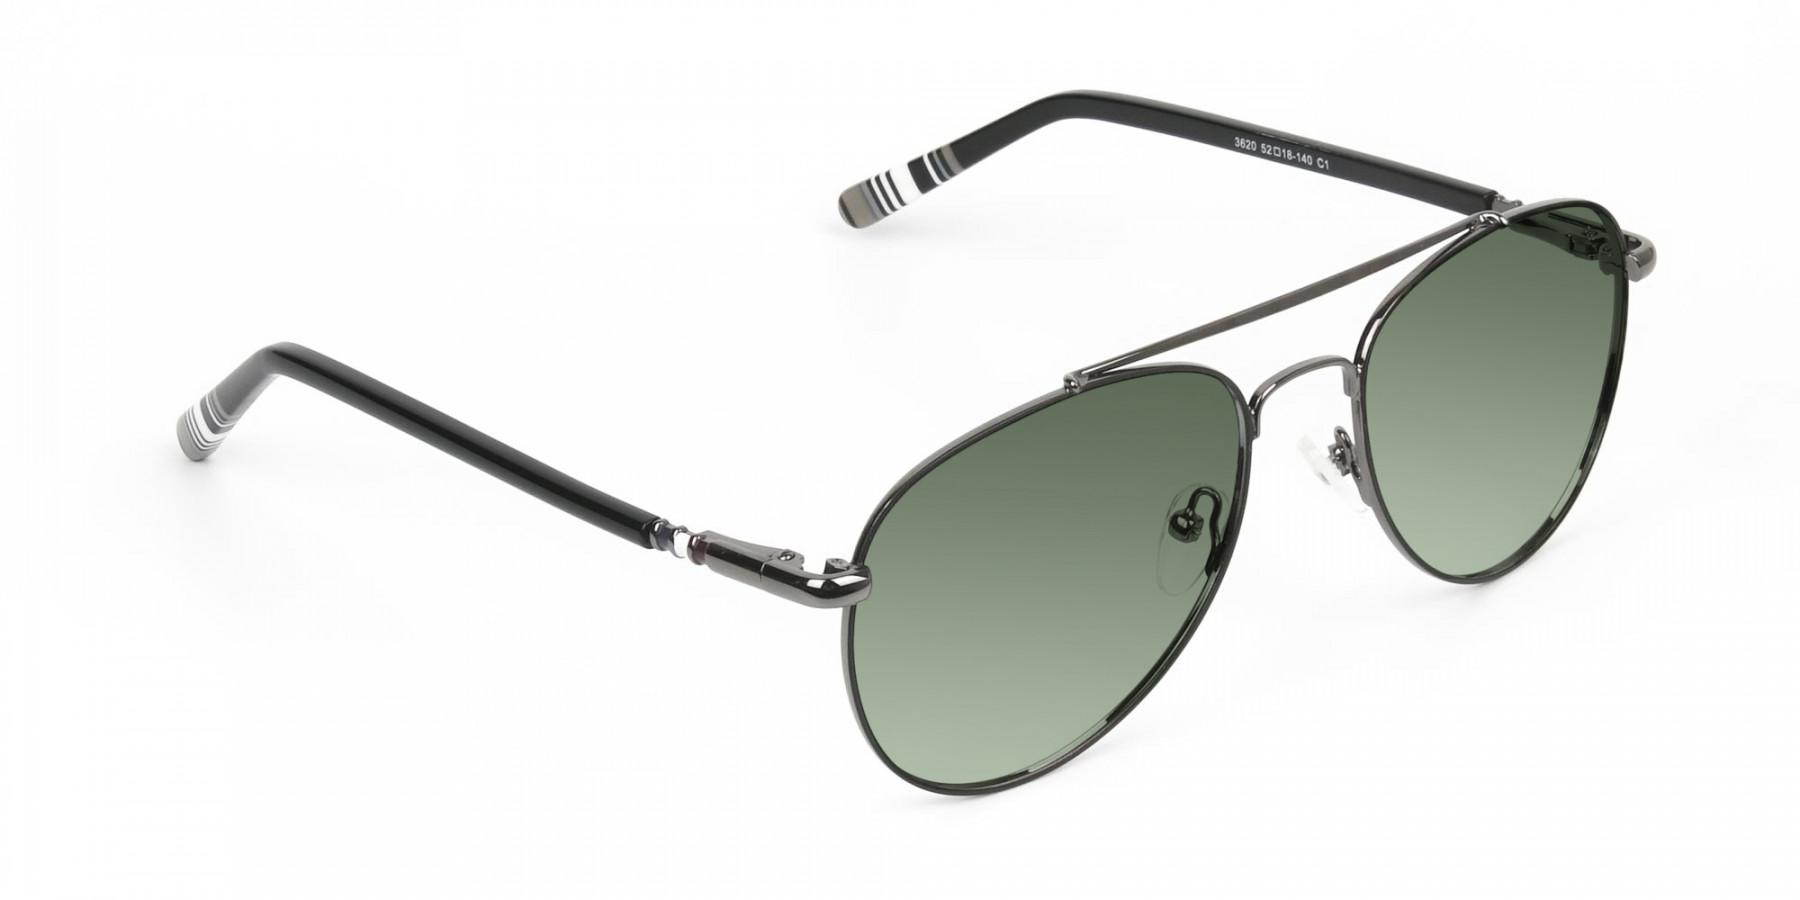 gunmetal-black-and-green-tinted-full-rim-aviator-sunglasses-frames-3